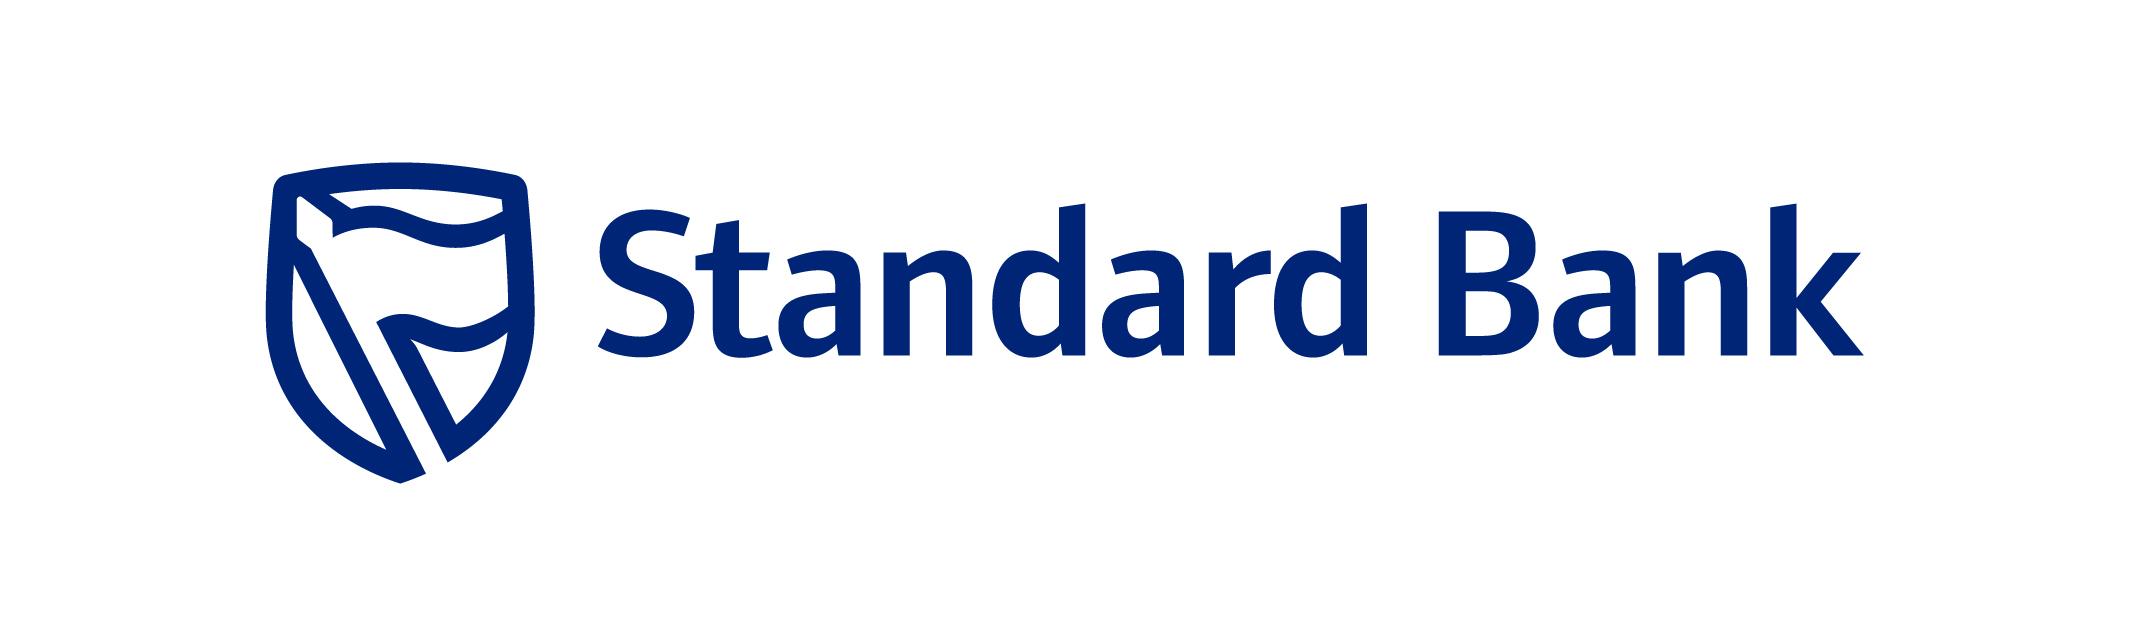 Standard Bank SBKP Icon Logo